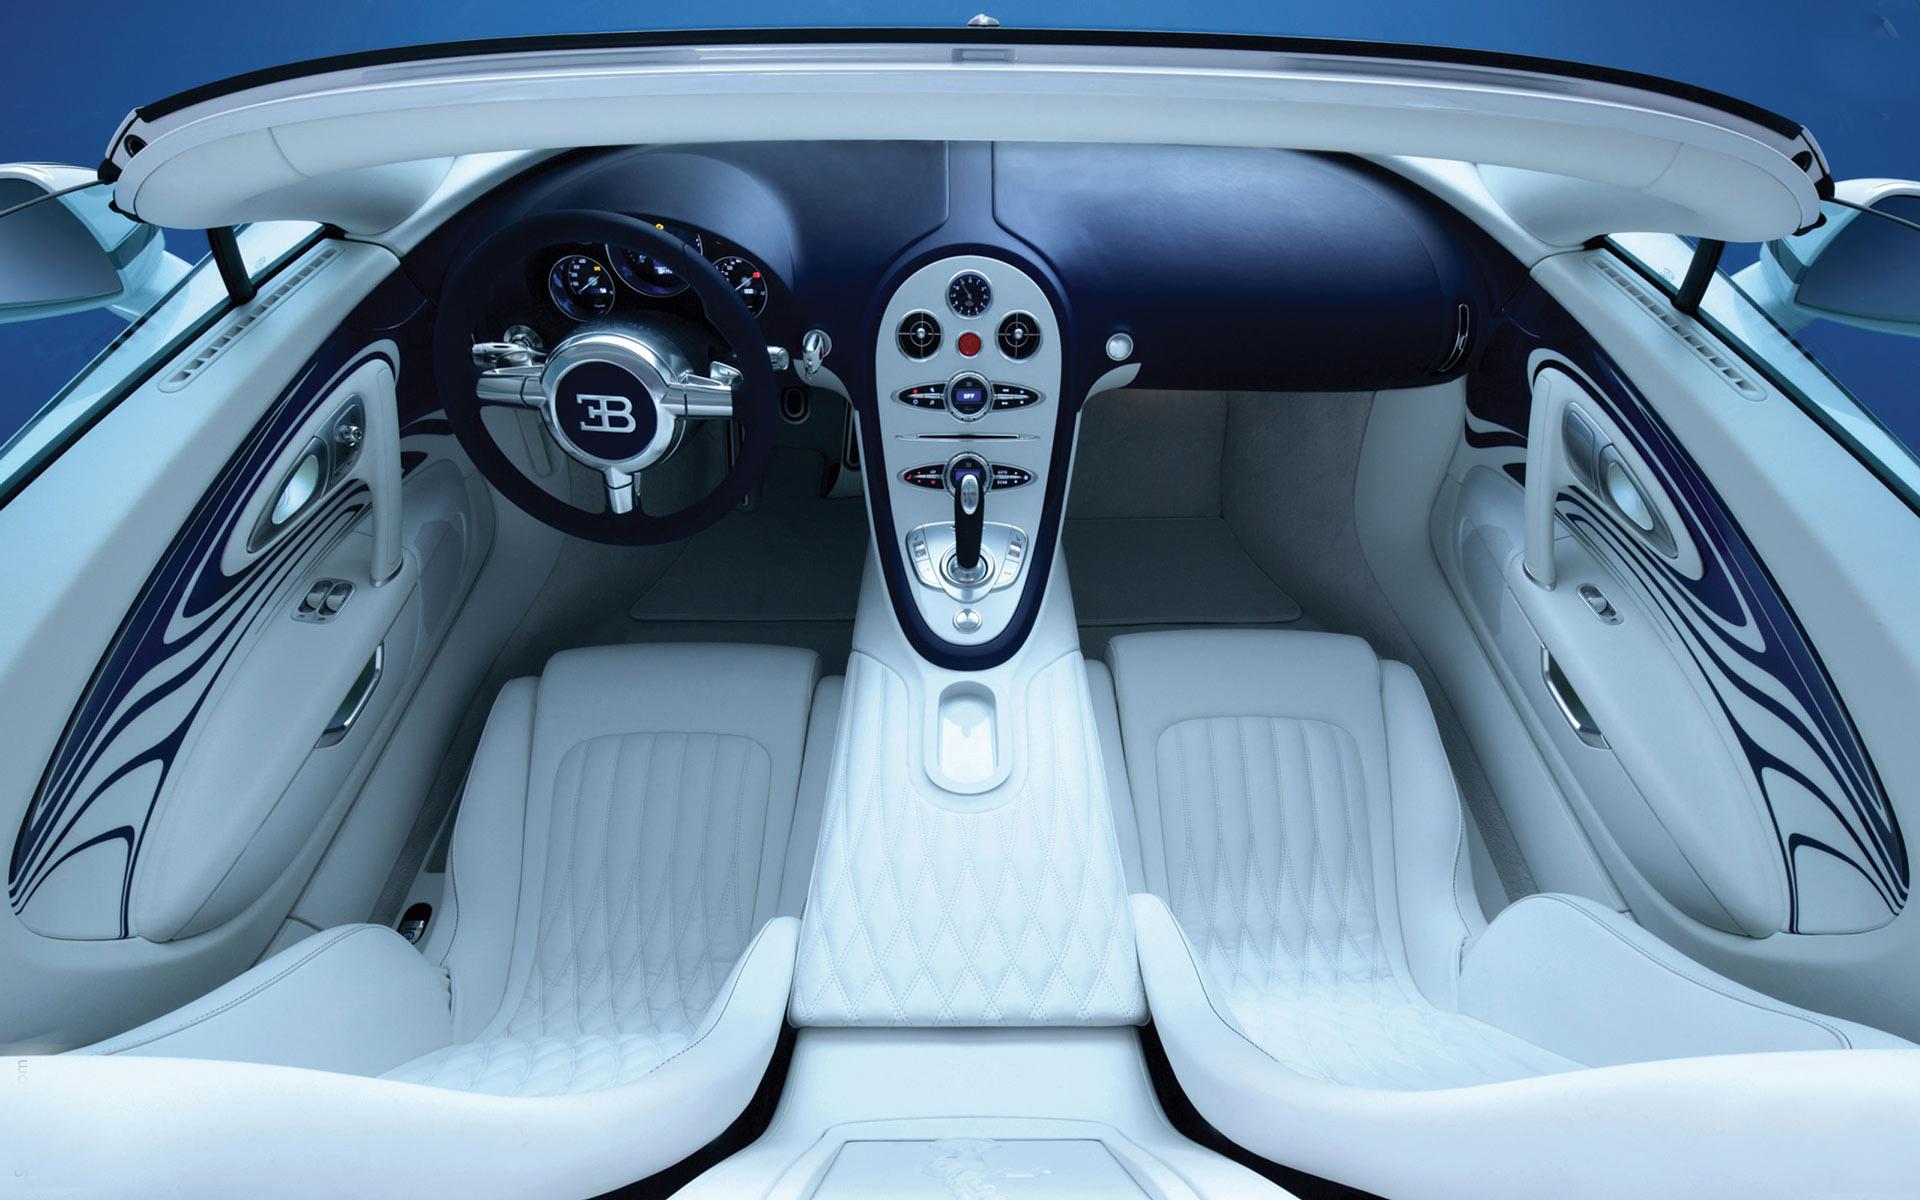 Bugatti-Veyron-Grand-Sport-Vitesse-Interior-Photo Stunning Bugatti Veyron 16.4 Grand Sport Vitesse Interior Cars Trend